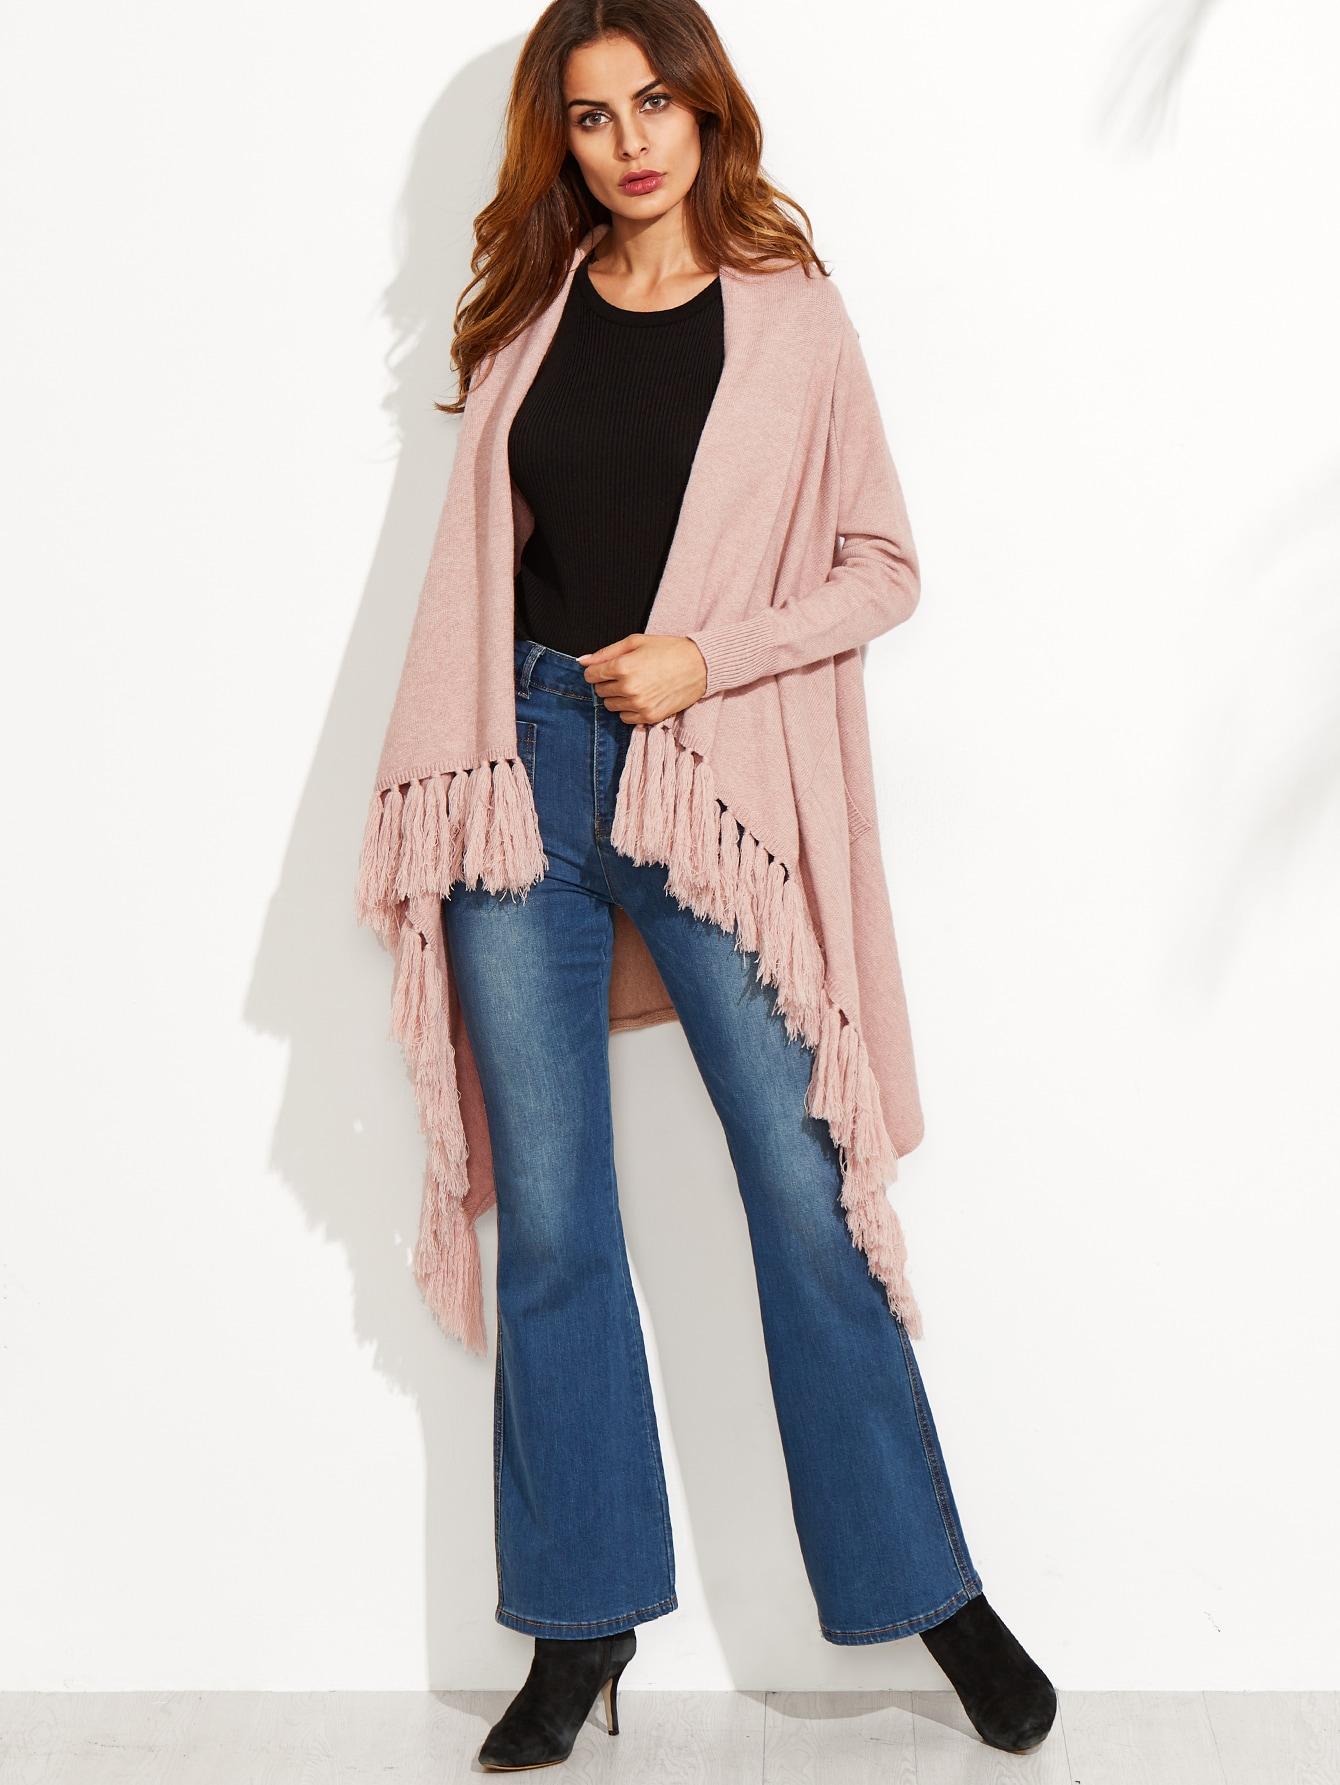 sweater160830576_2